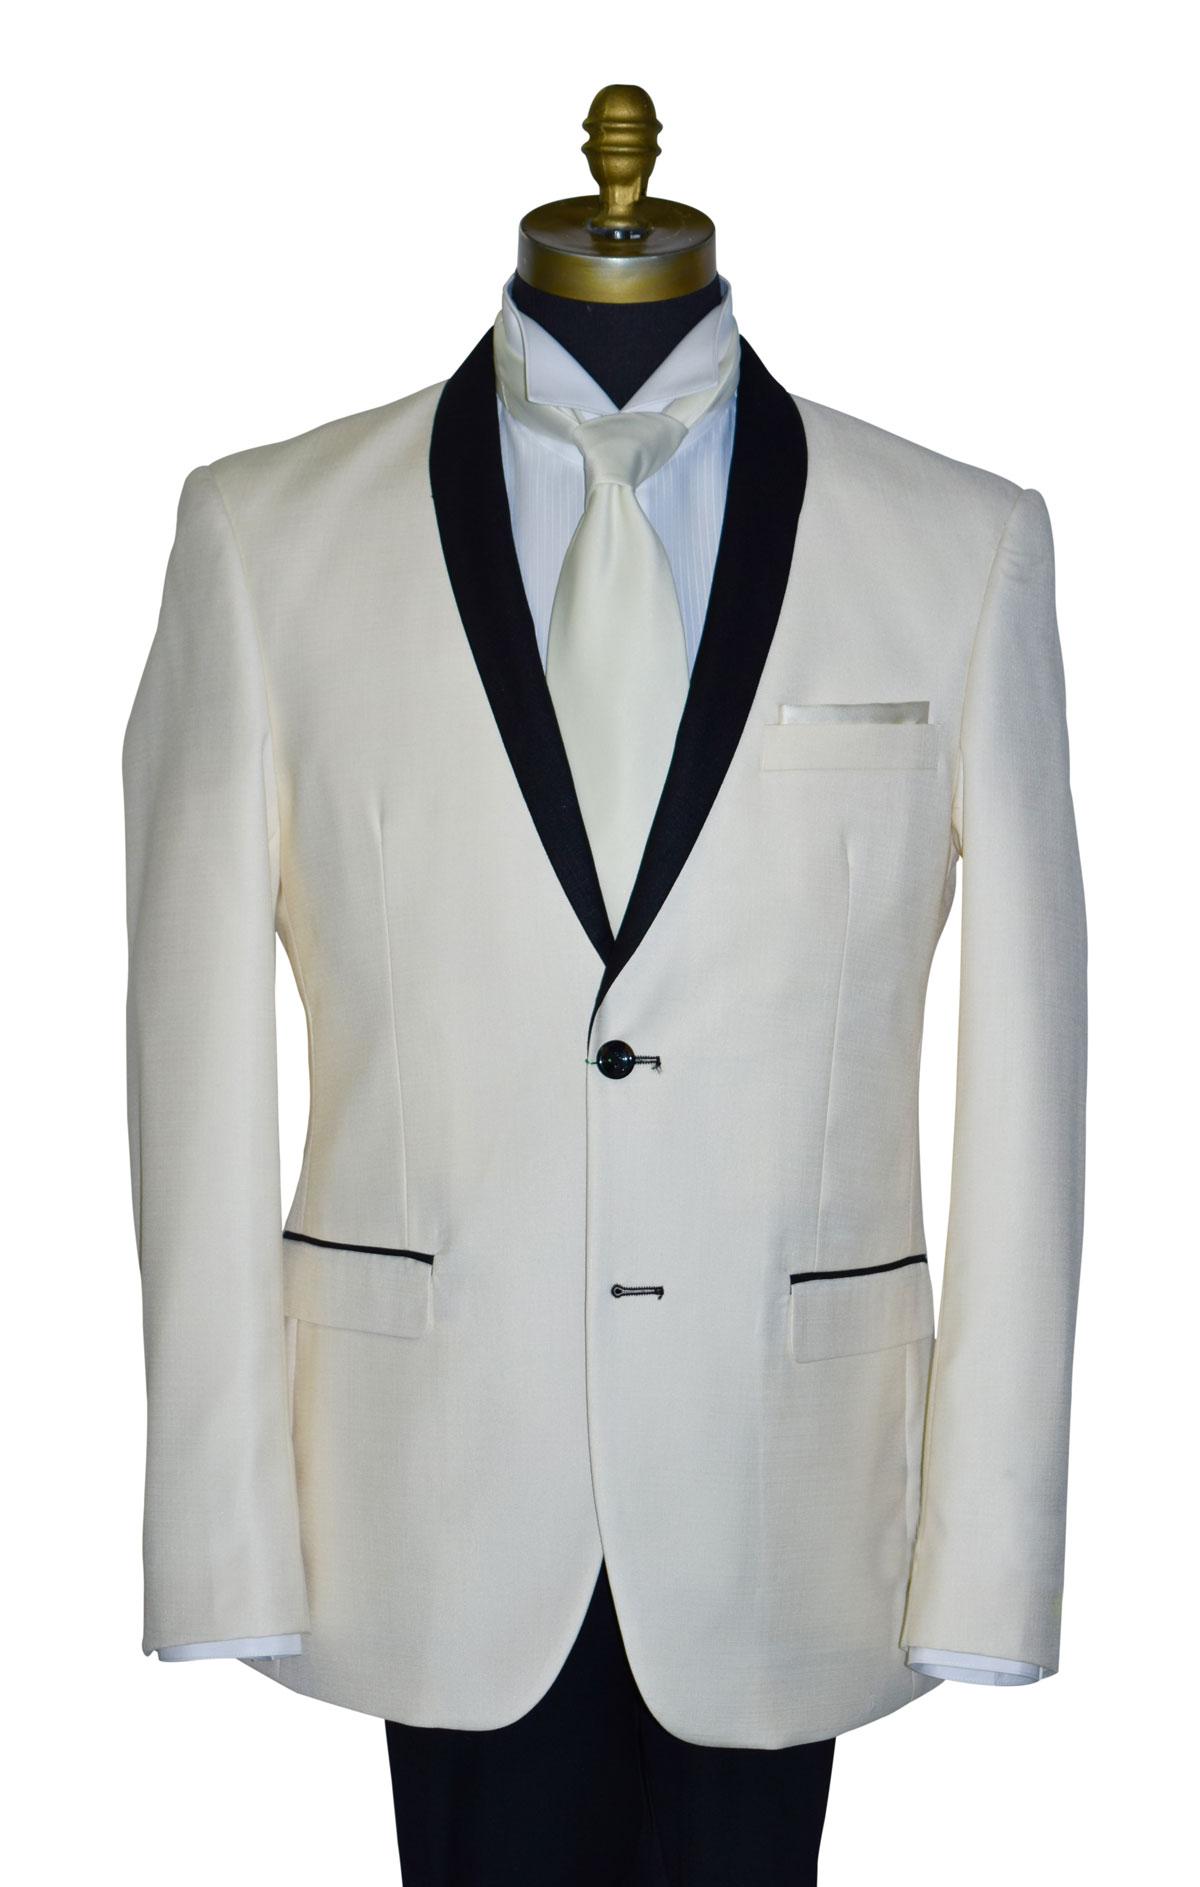 Ivory Coat With Black Shawl Collar